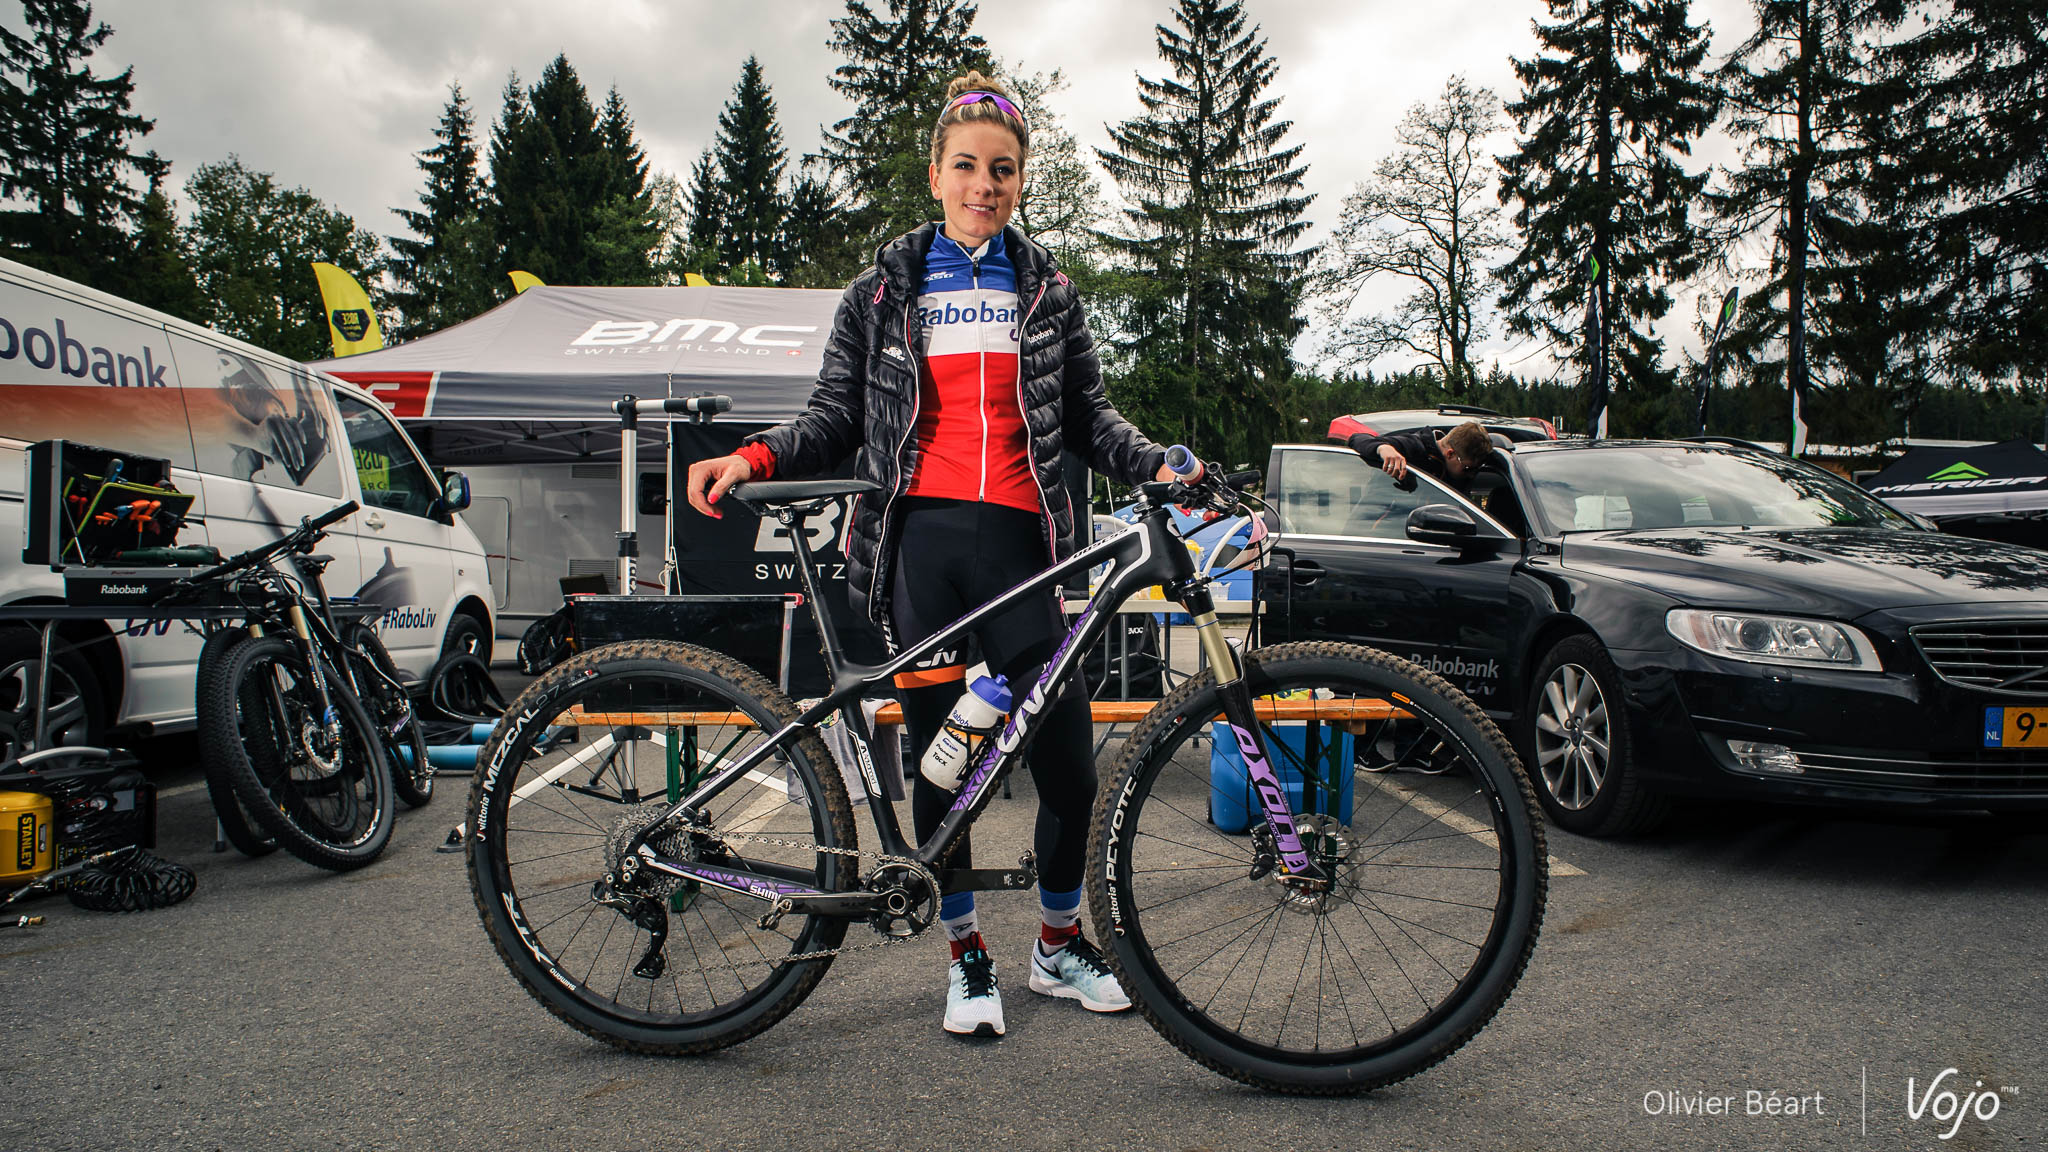 Giant_Liv_Obsess_Pauline_Ferrand_Prevot_World_Cup_Bike_Copyright_OBeart_VojoMag-1